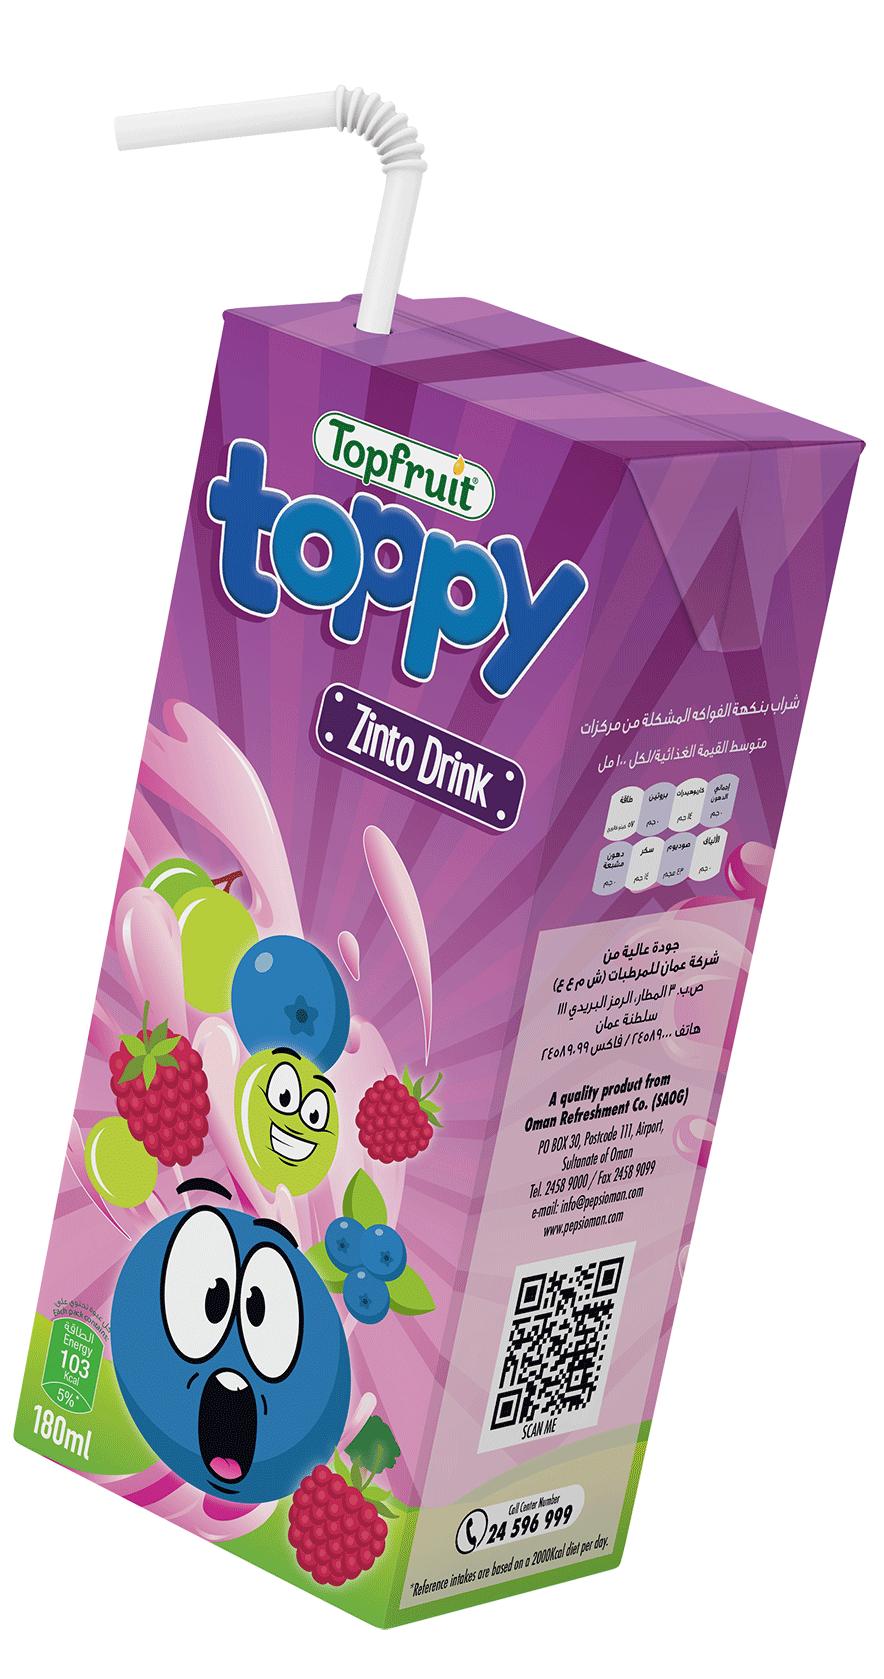 TopFruit Toppy Zinto 180 ml